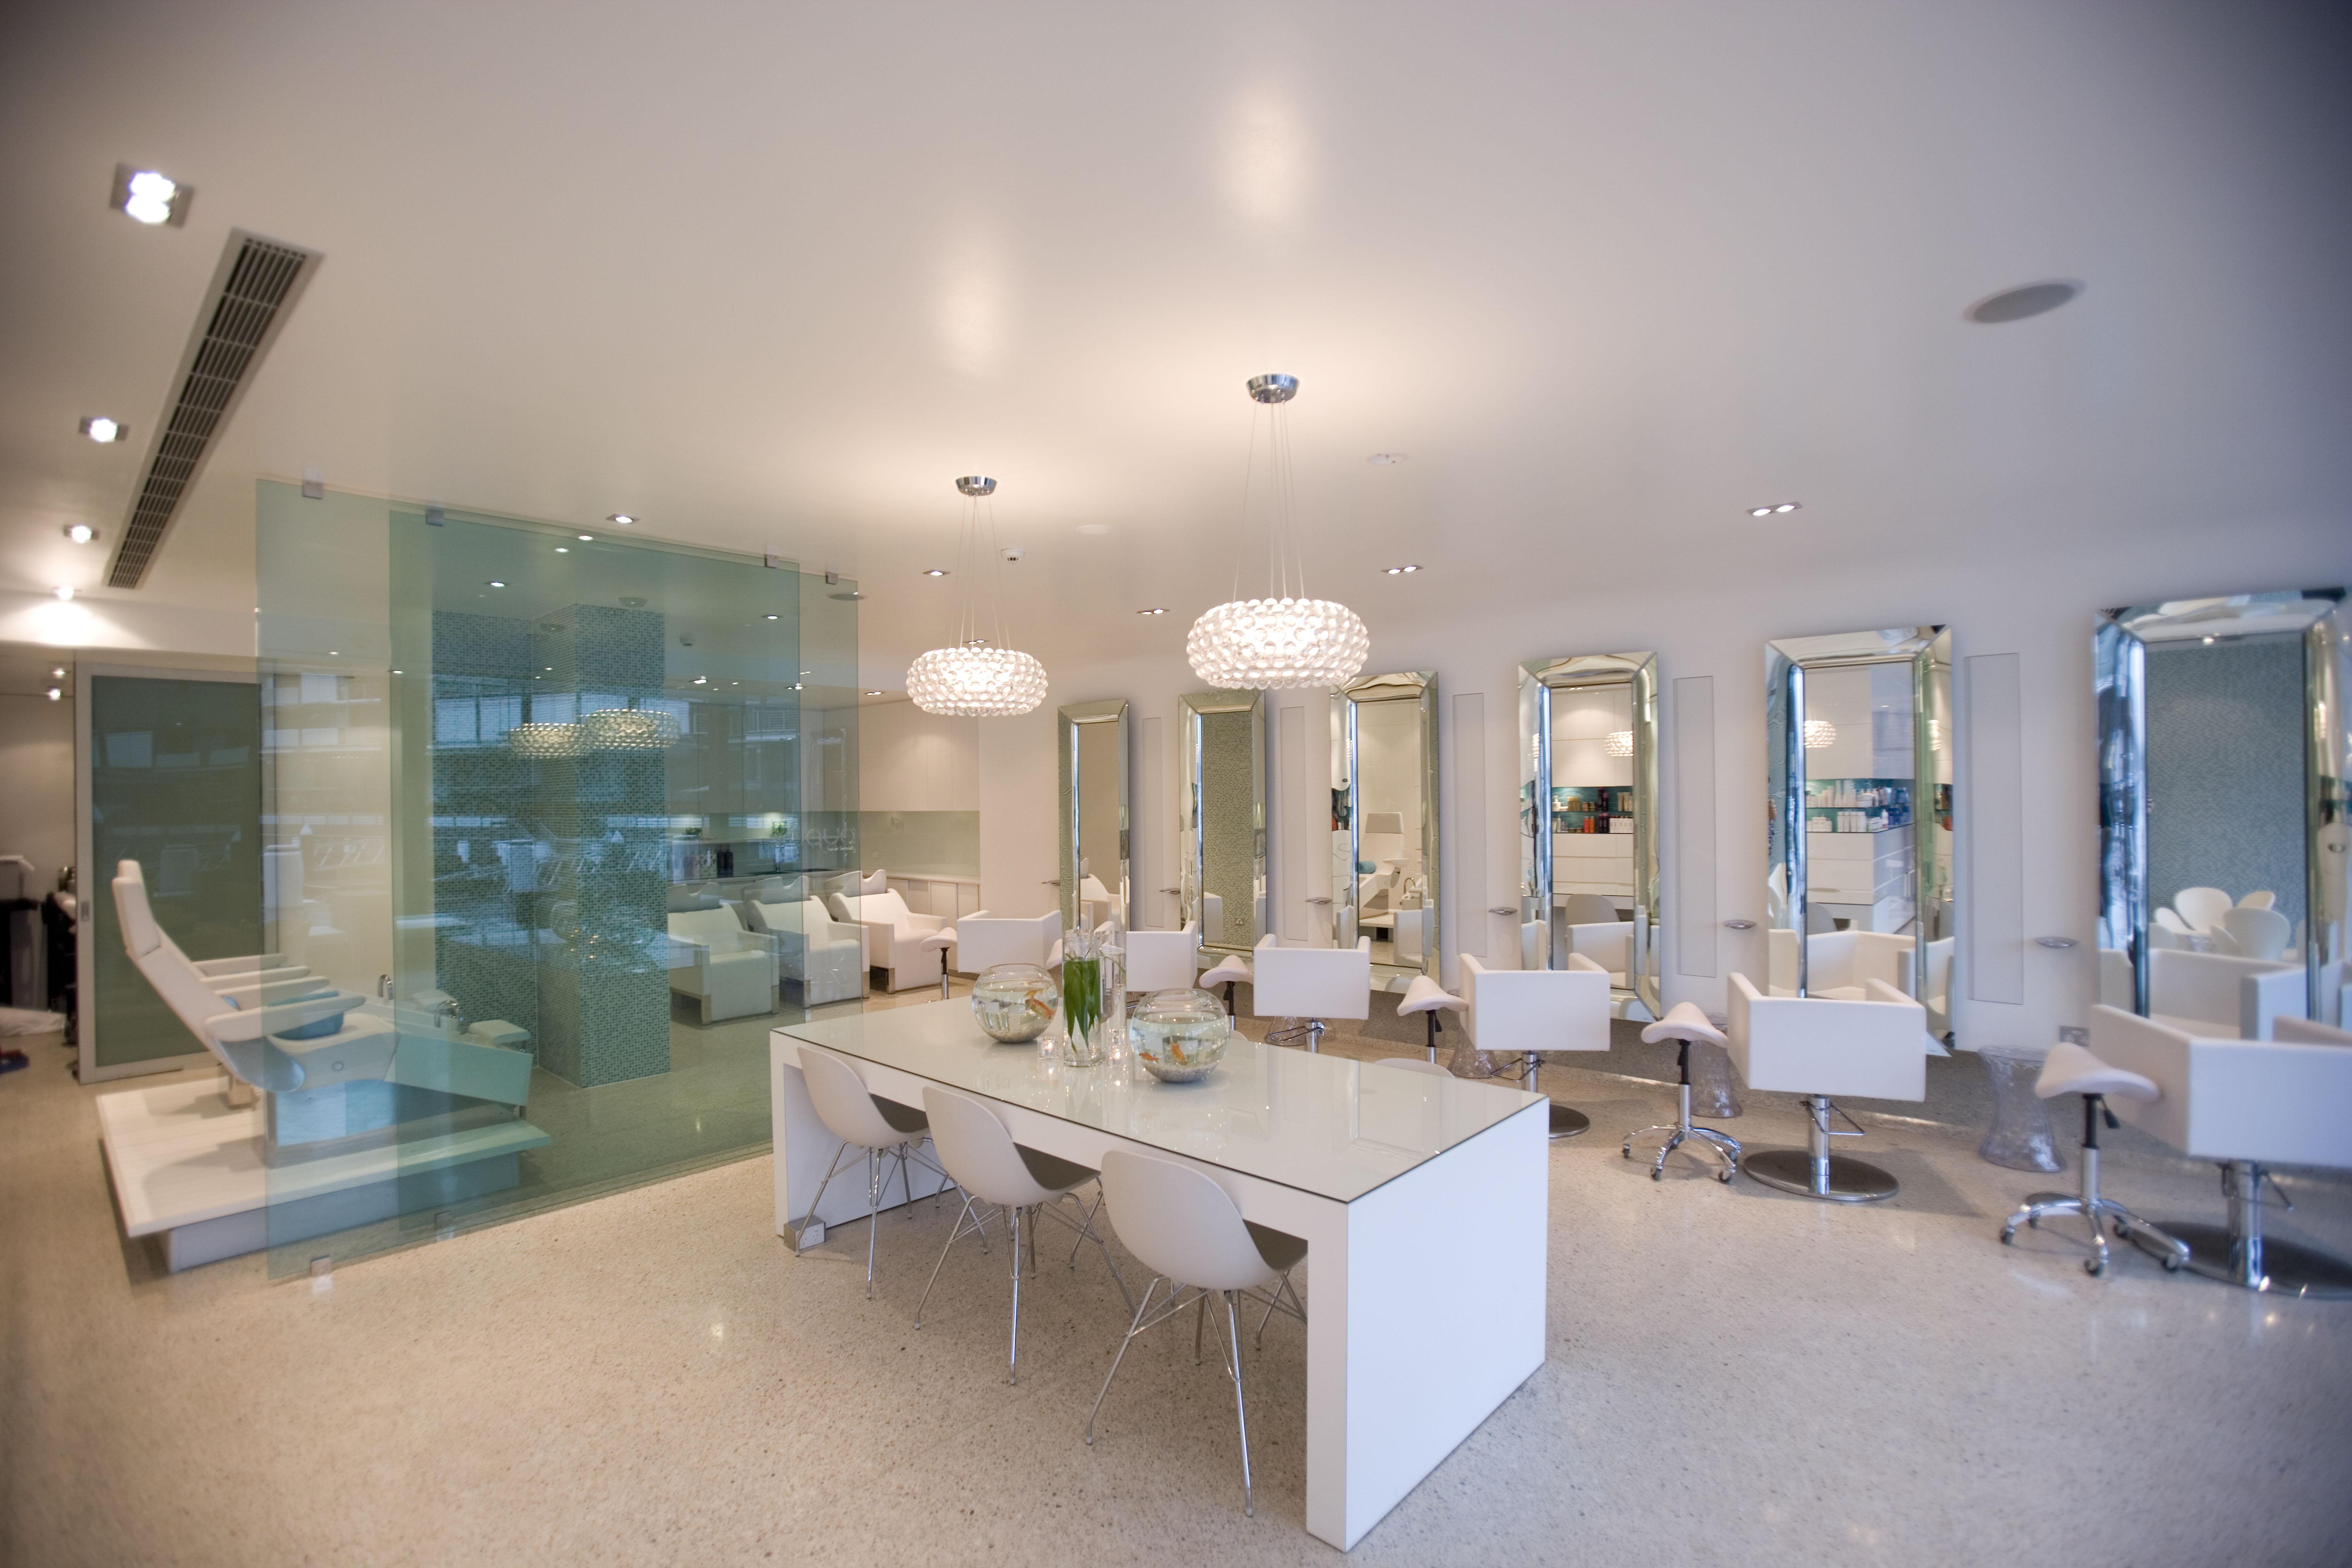 Salon decorating ideas 4 do s and 3 don 39 ts salons direct for Photos salon design